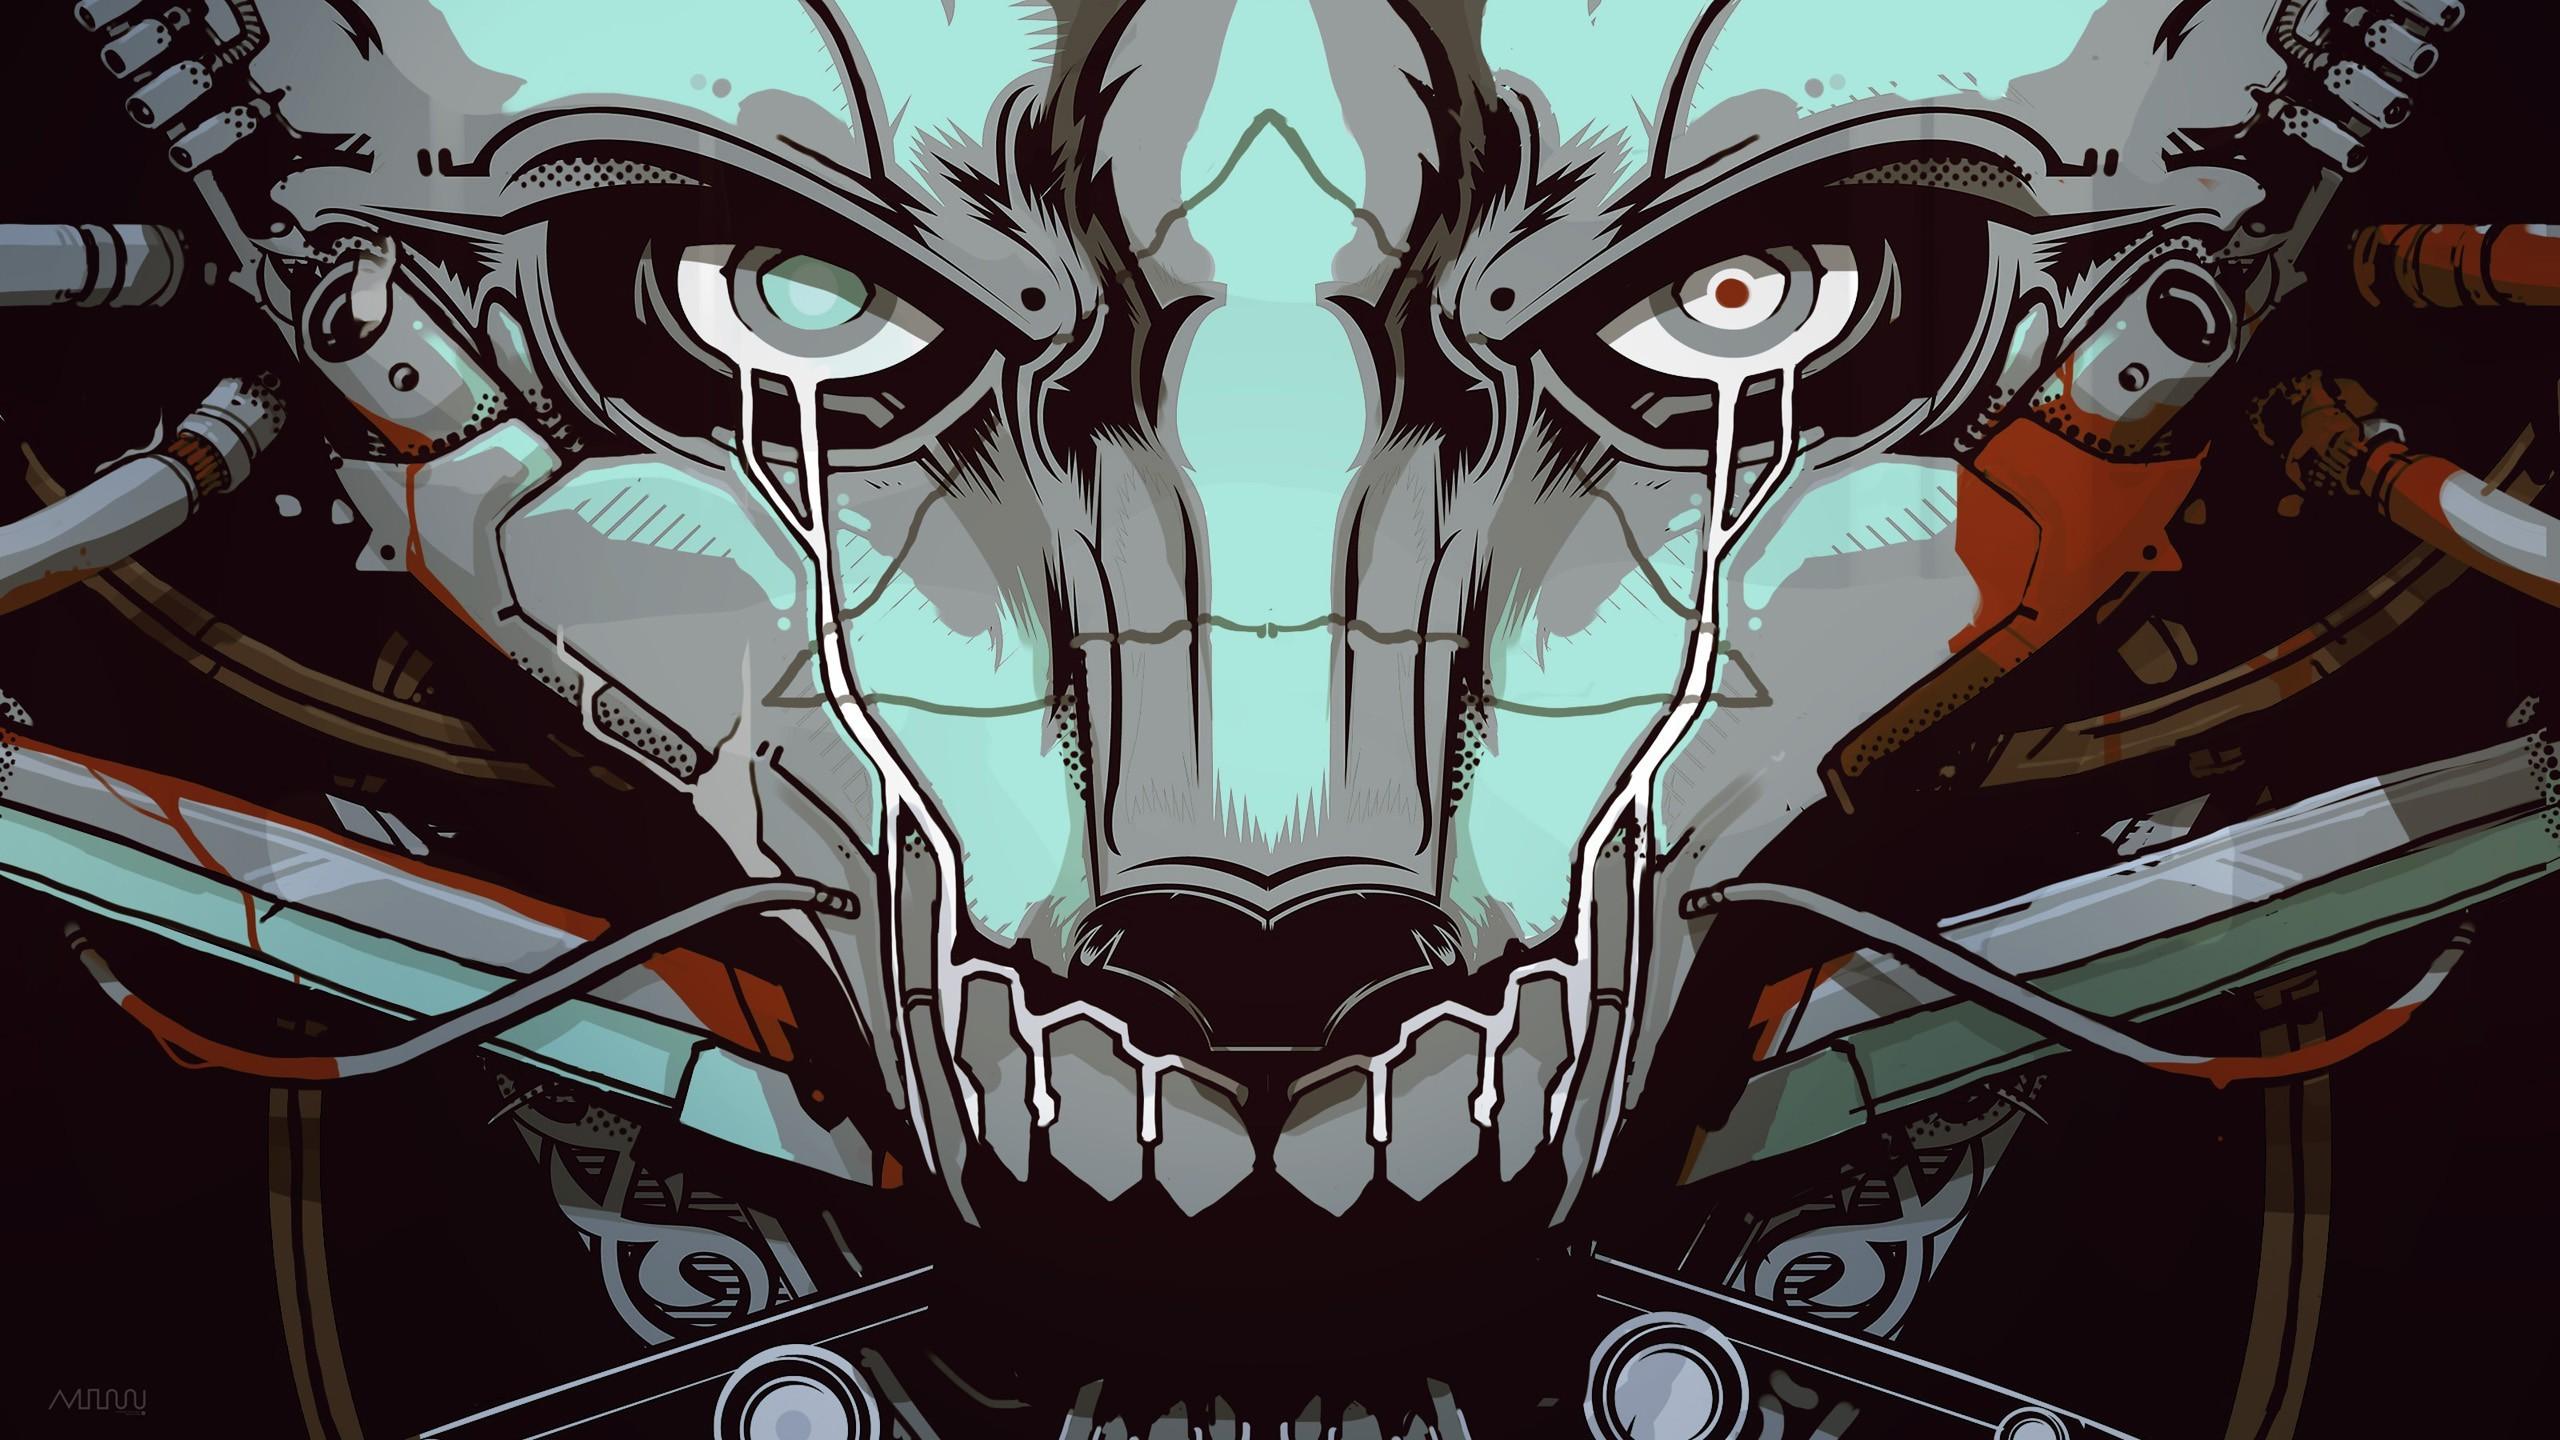 Wallpaper Illustration Digital Art Cyberpunk Anime Robot Futuristic Music Graphic Design Skull Cyborg Machine Art Graphics Mecha 2560x1440 Px Computer Wallpaper Fictional Character Font Fiction Supervillain Cg Artwork 2560x1440,Custom Pools By Design